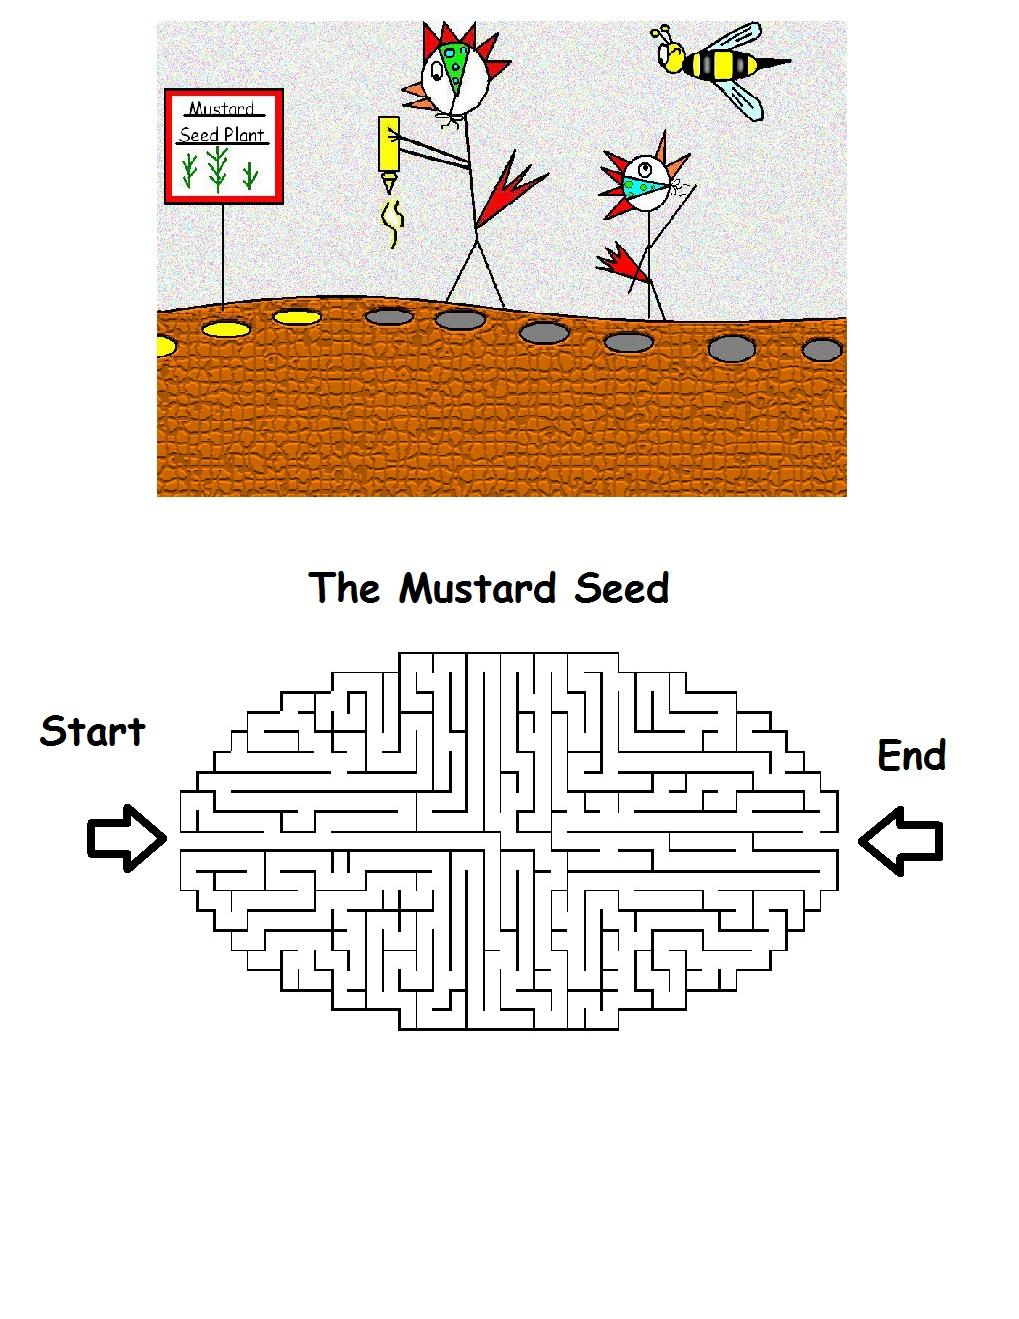 Mustard Seed Maze Printable Version